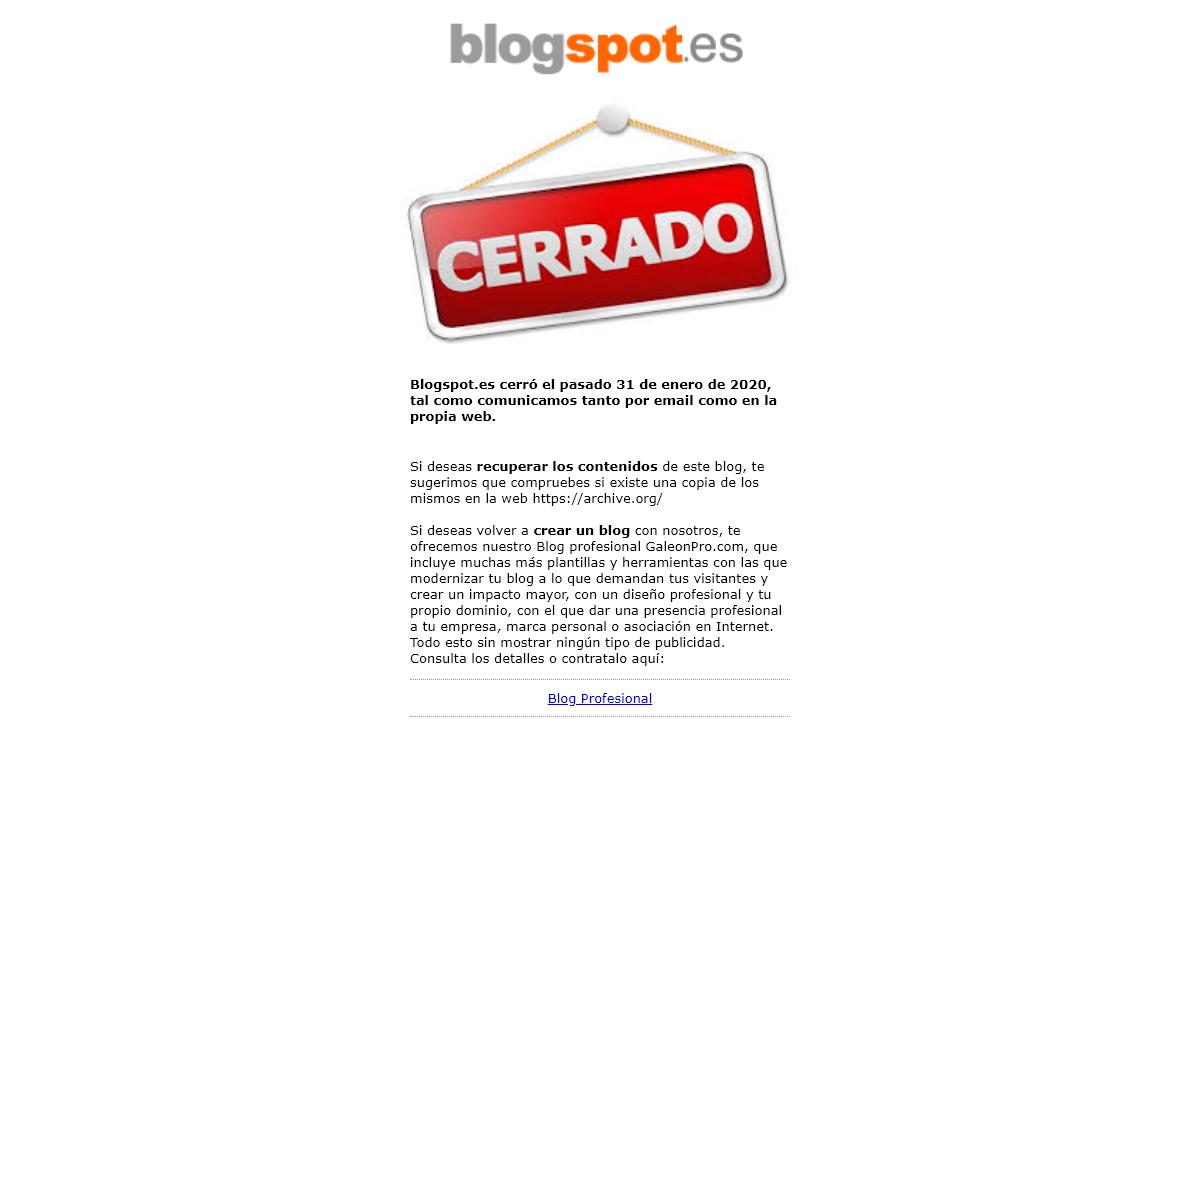 ¡Adios compañeros de Blogspot.es!